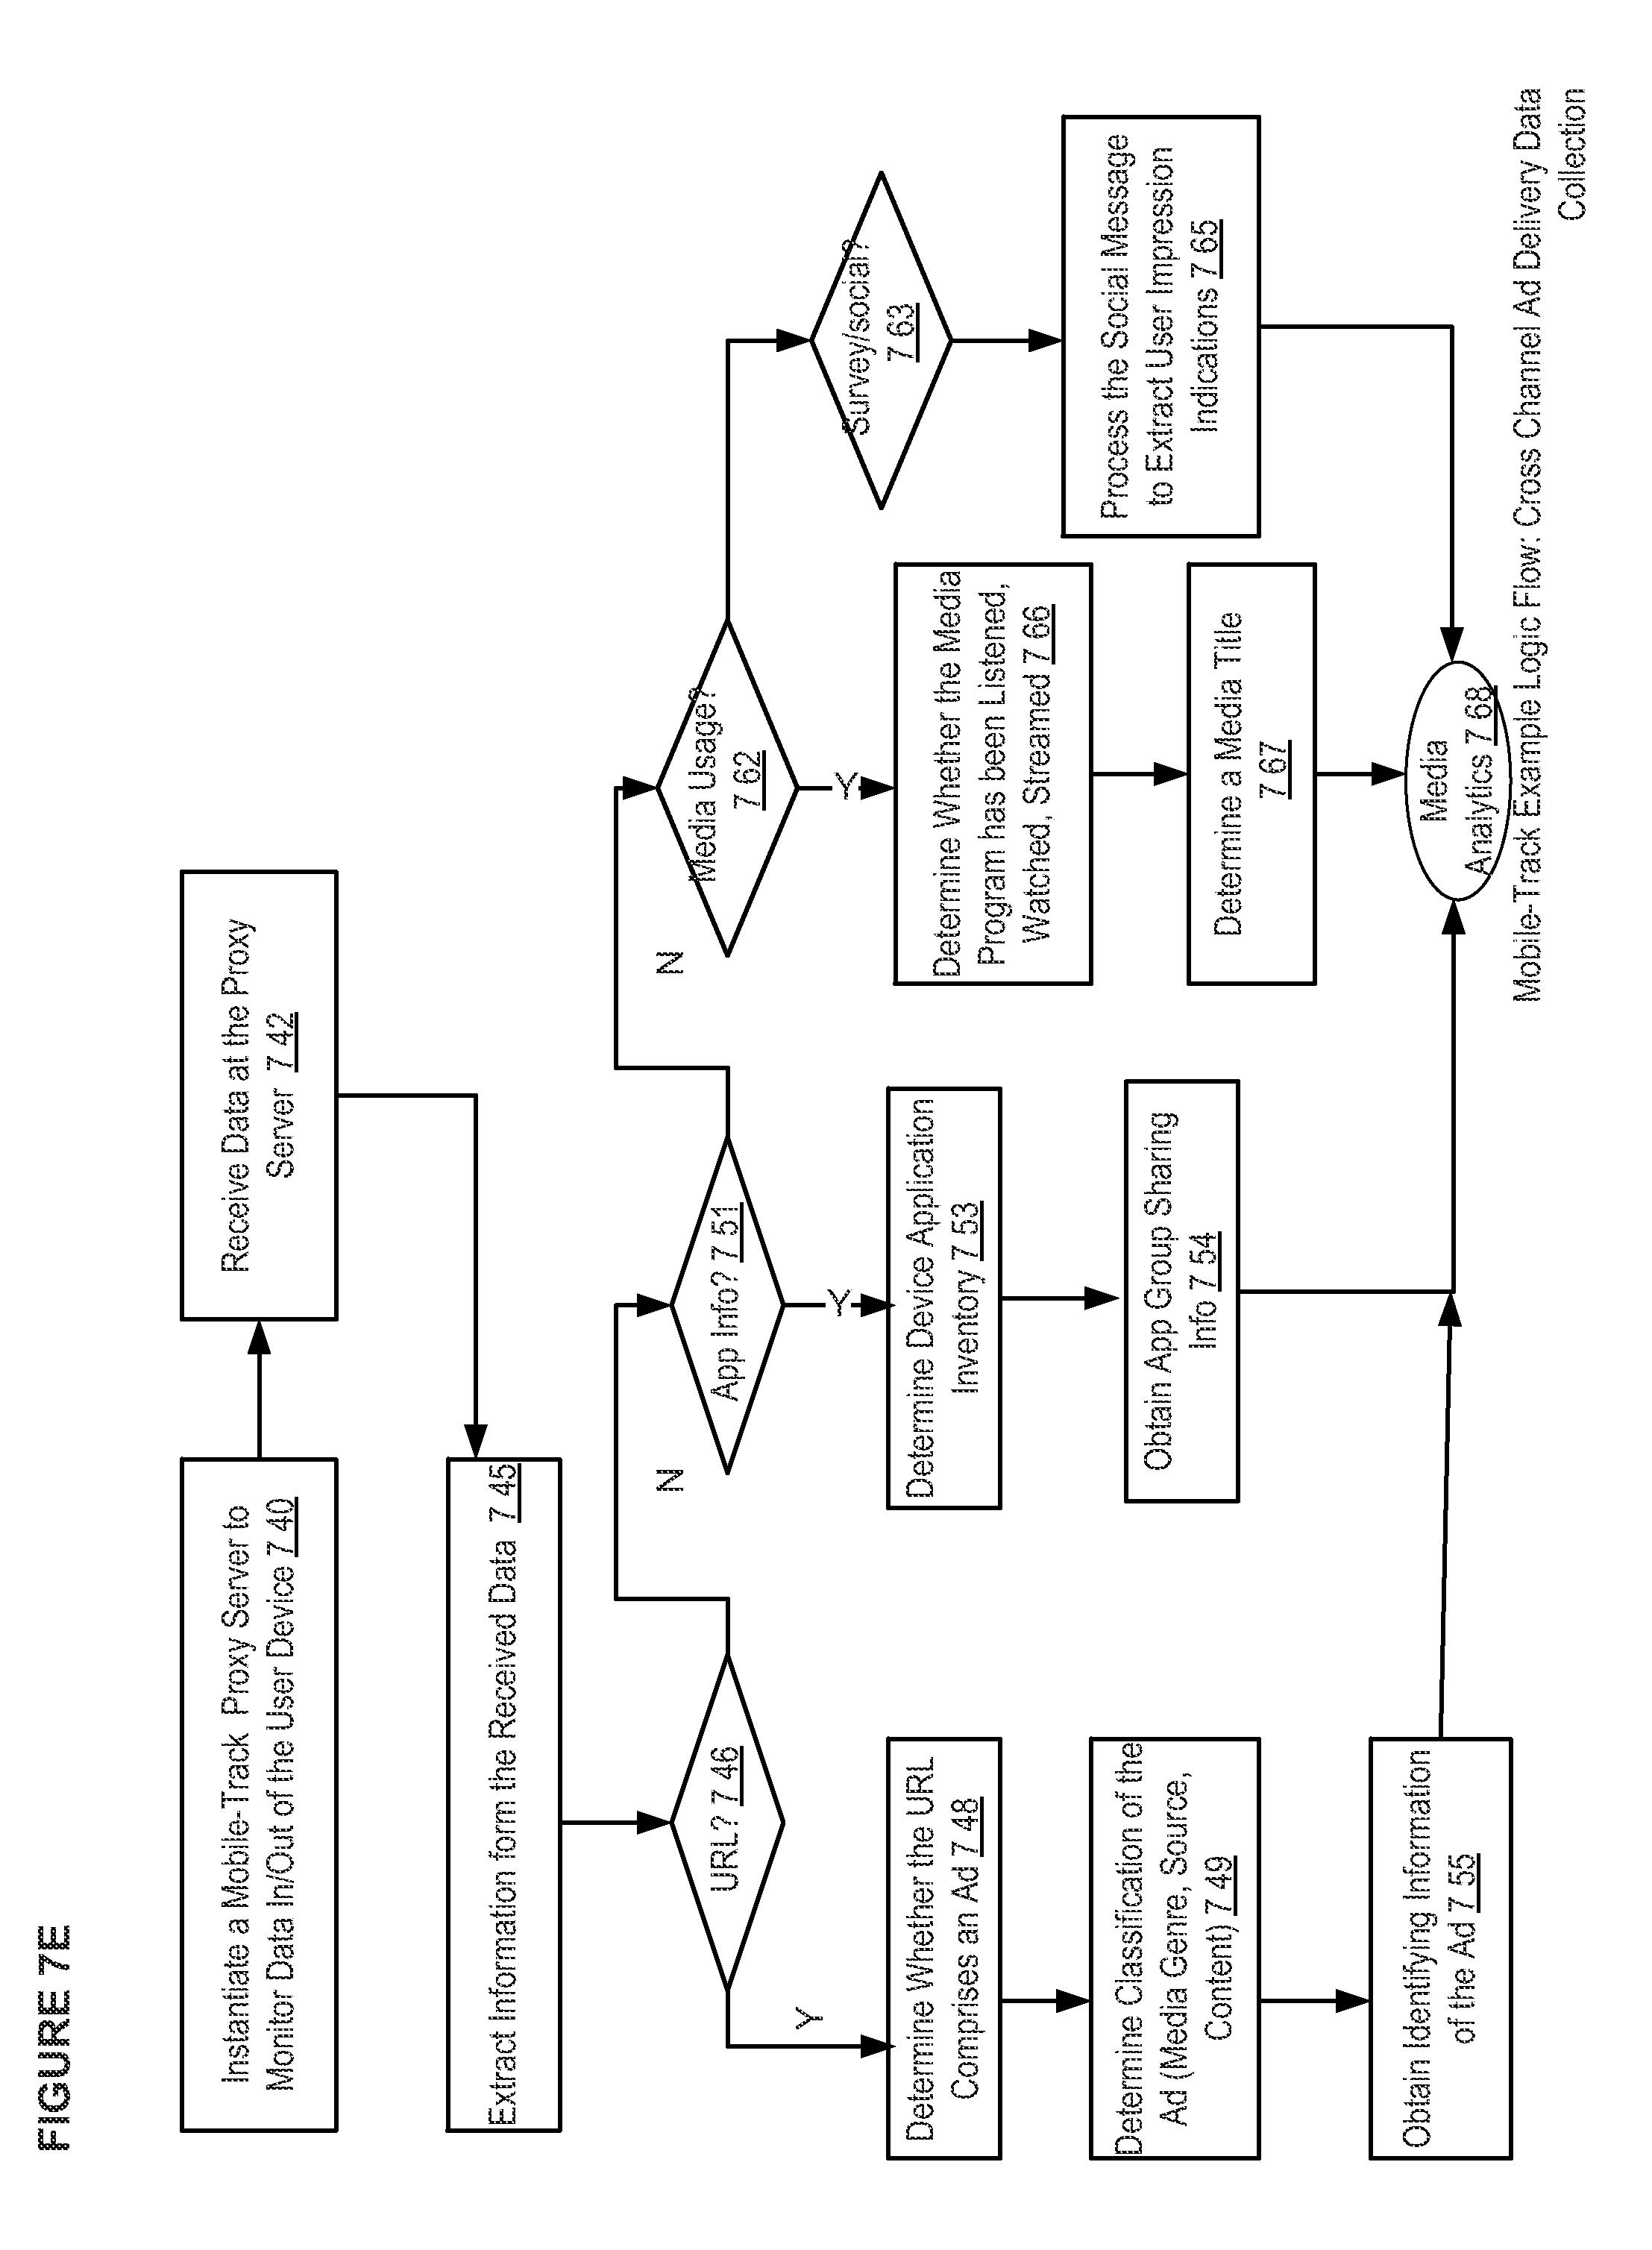 Patent US 8,667,520 B2